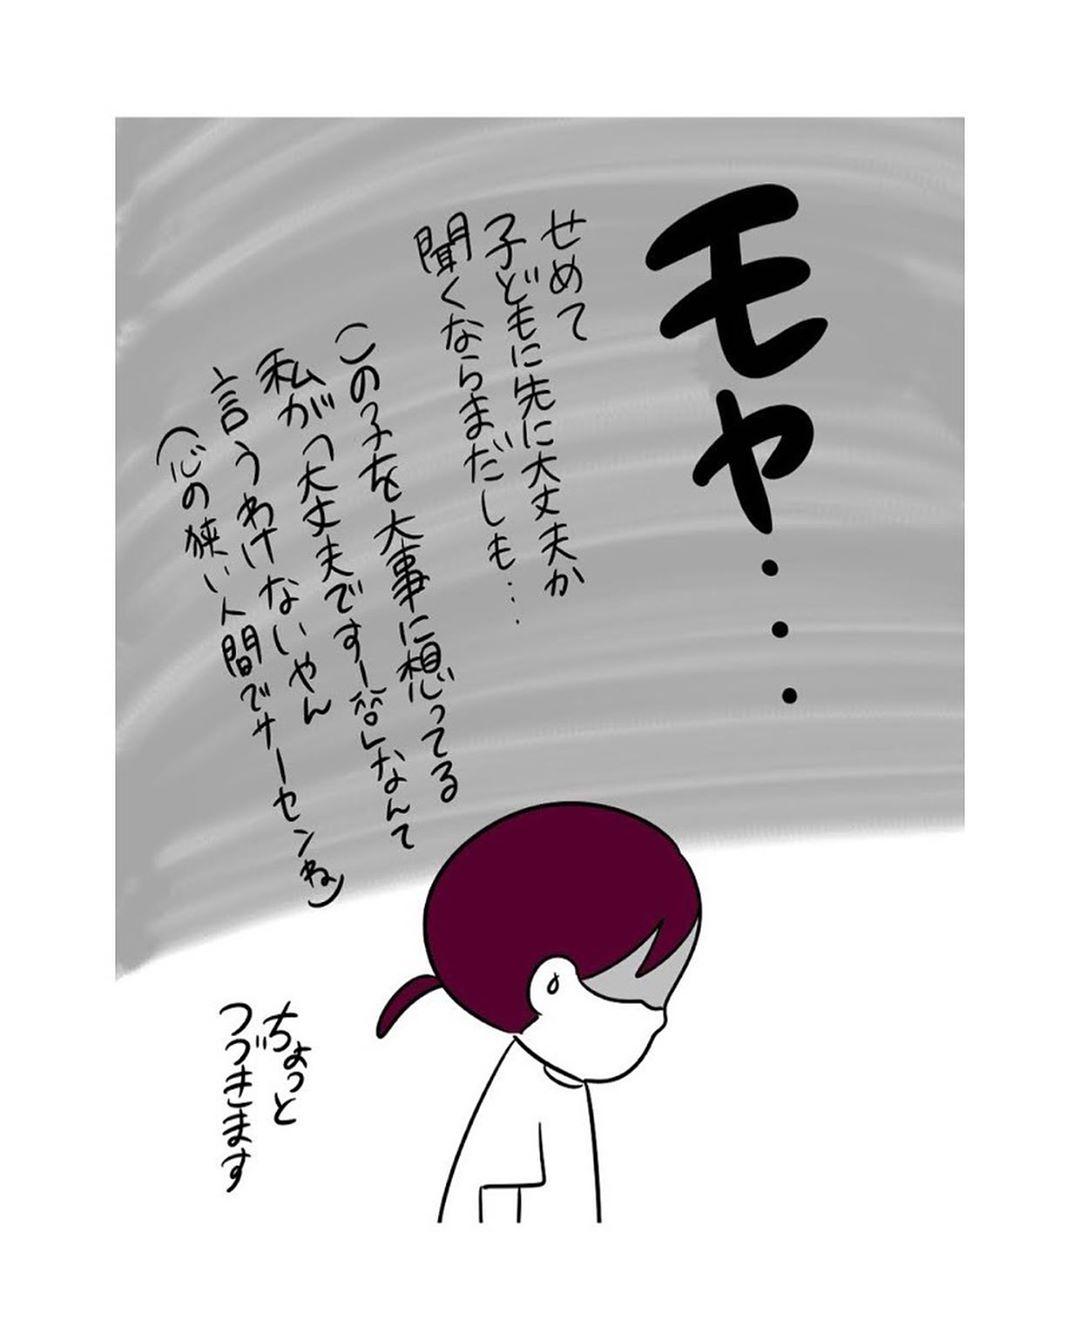 shirota.yunya_72271226_164440661332267_1495980857741492445_n